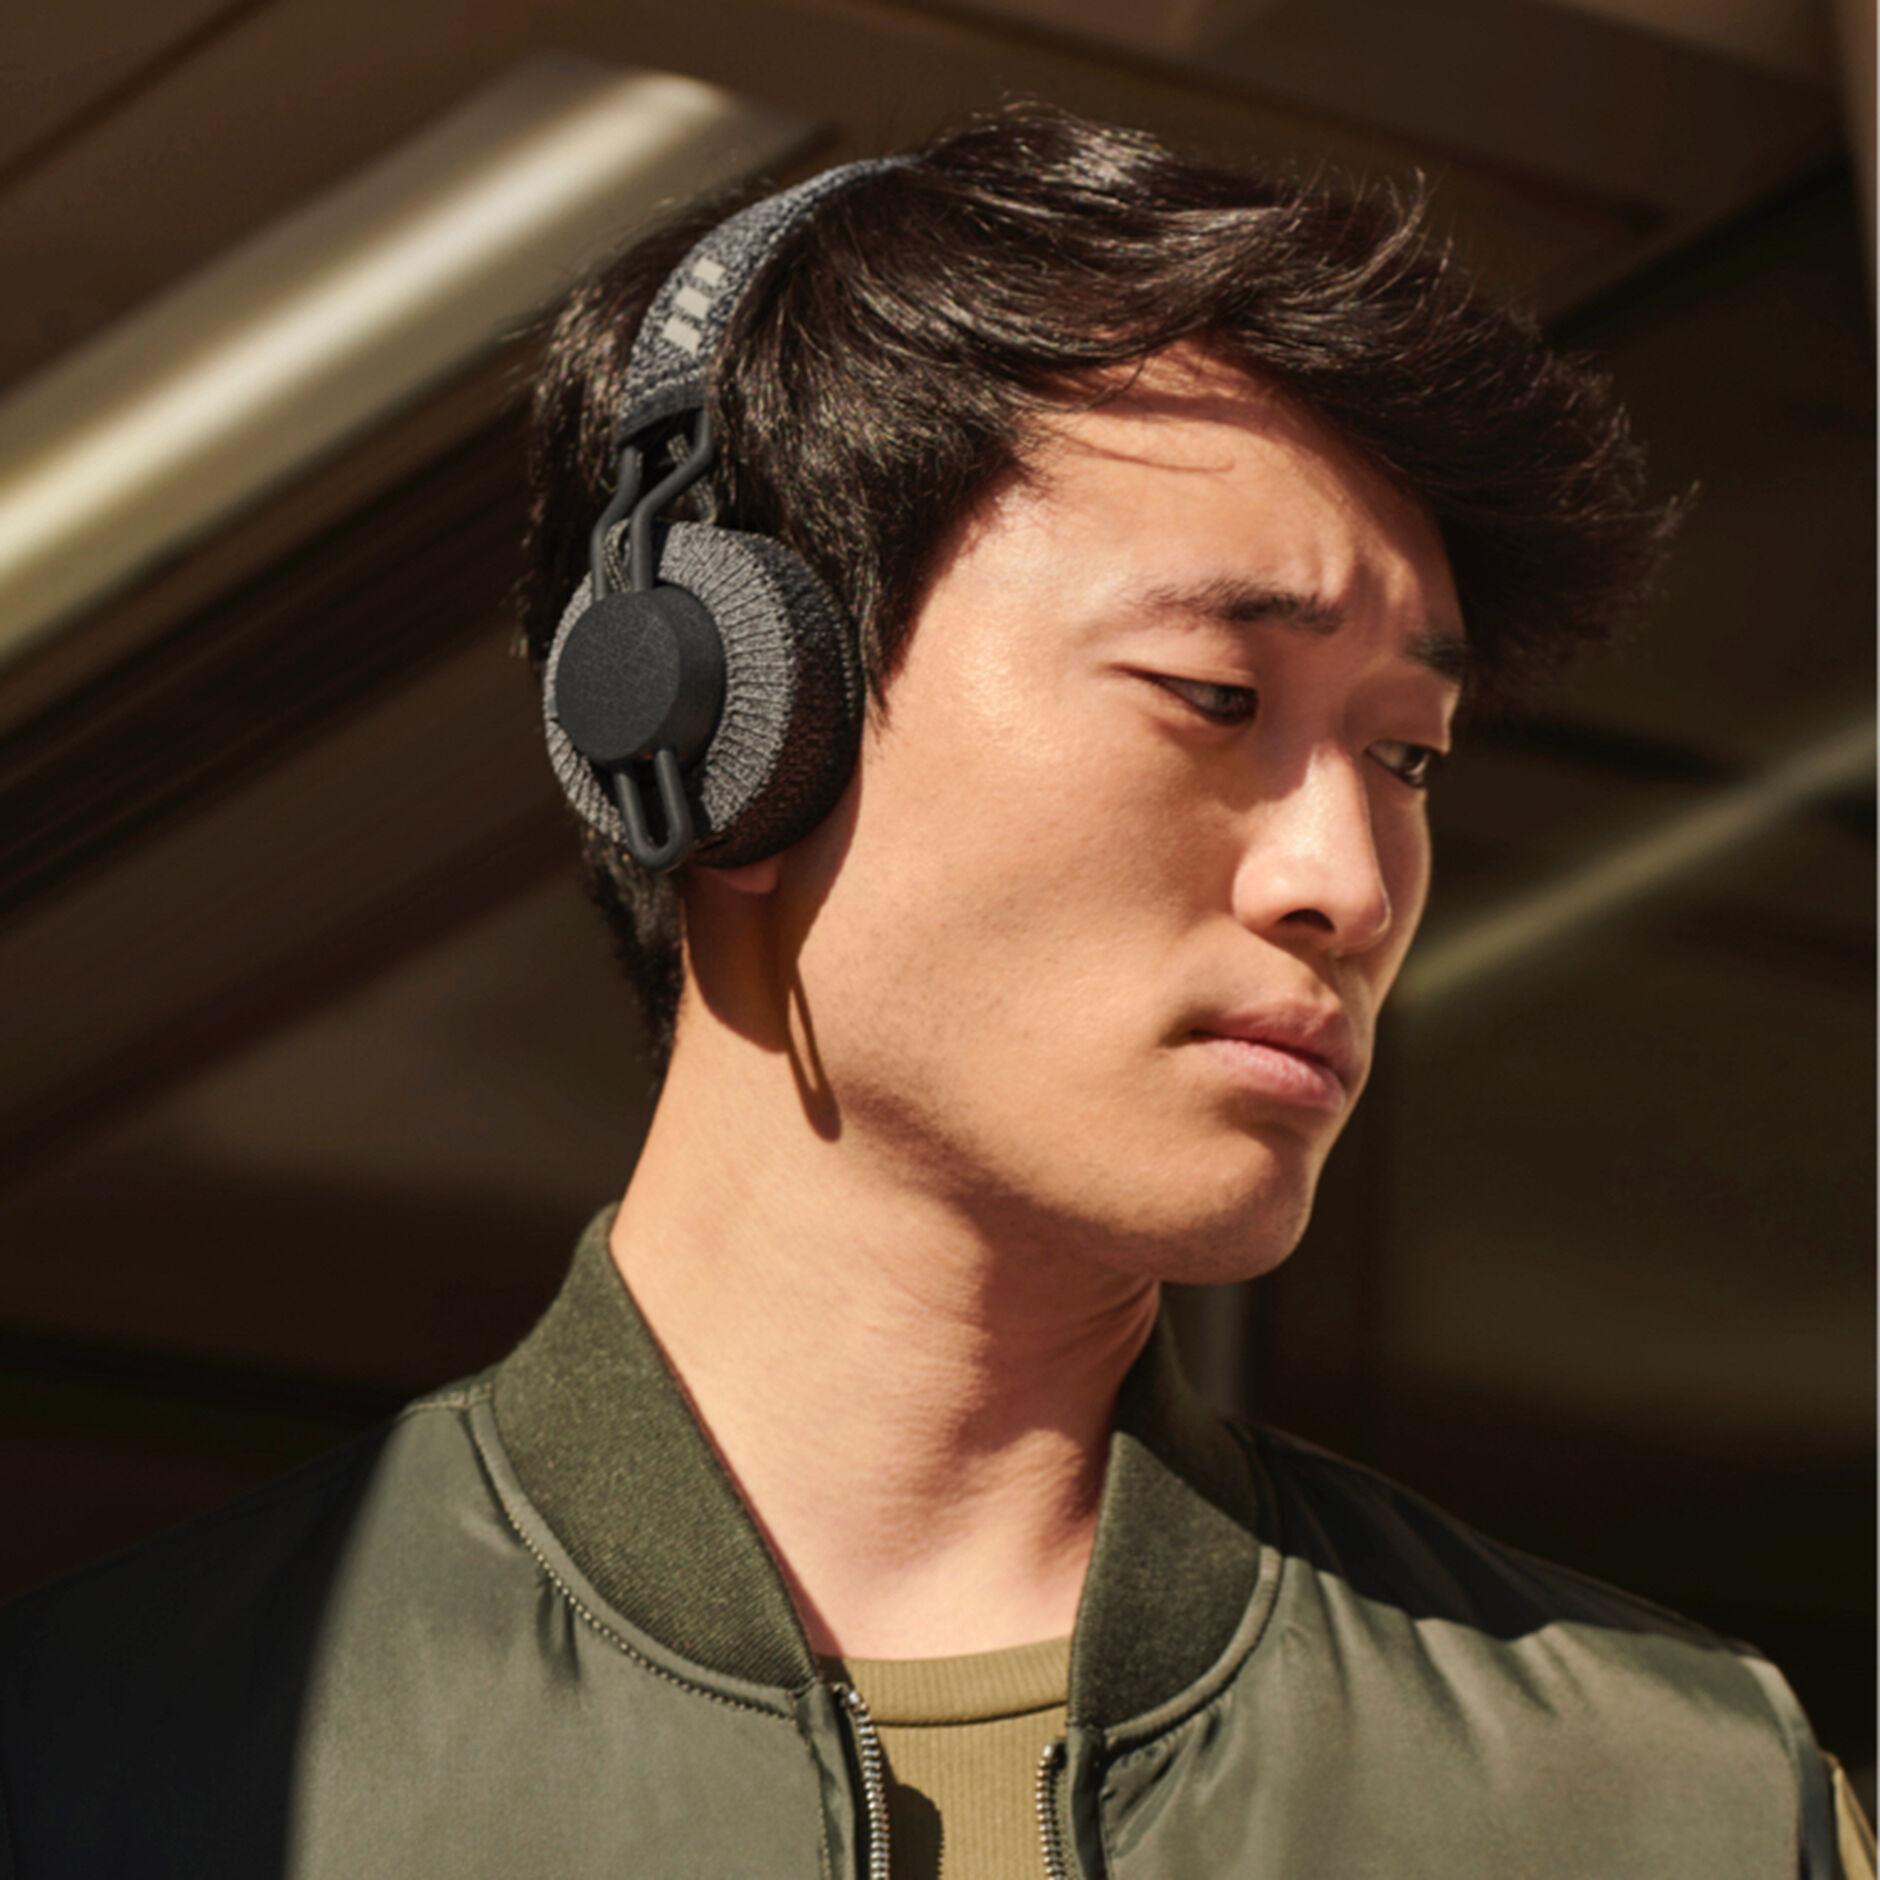 Adidas Headphones: Extra 50% off sitewide